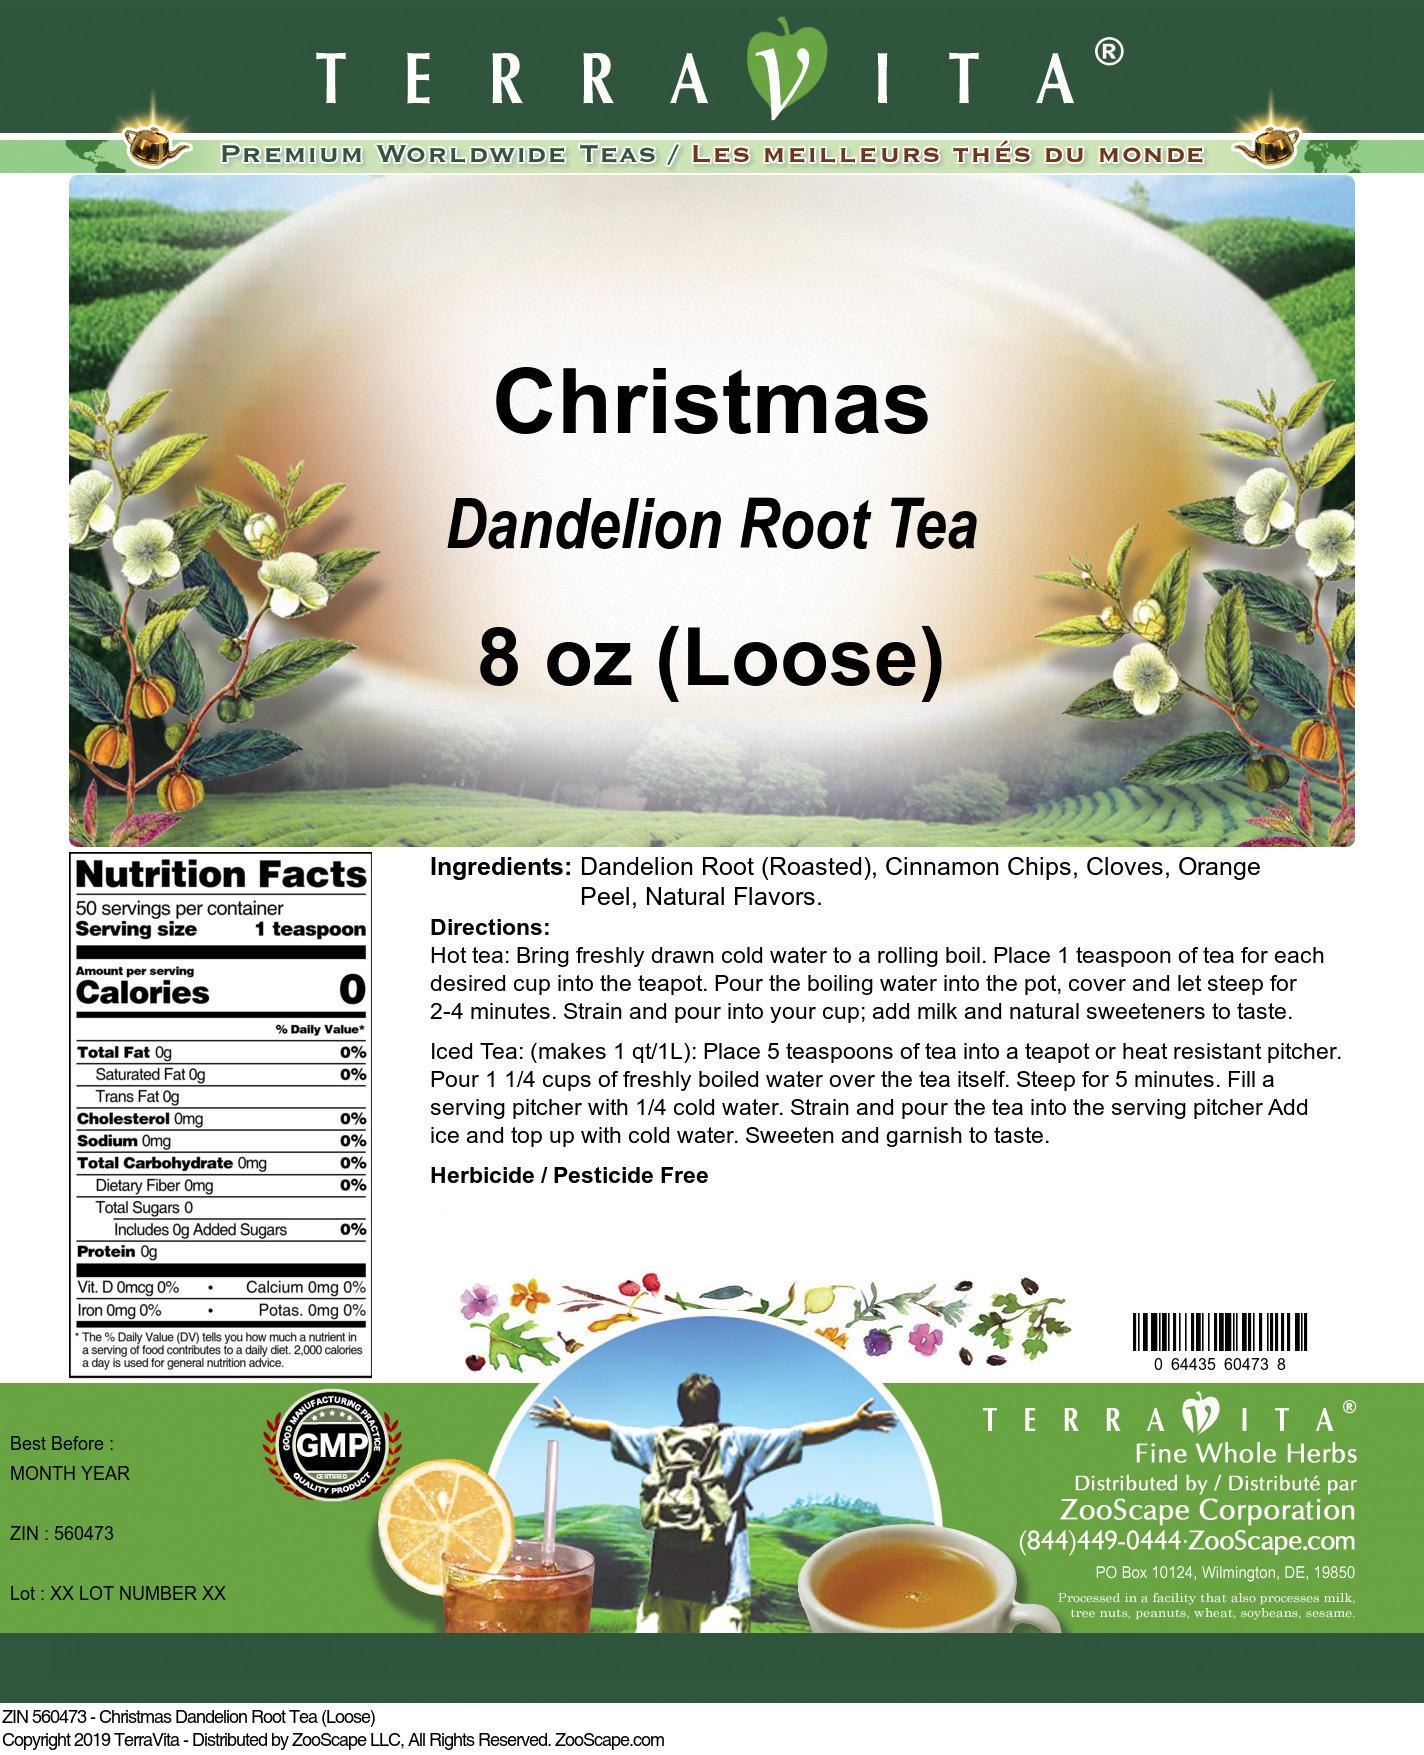 Christmas Dandelion Root Tea (Loose)